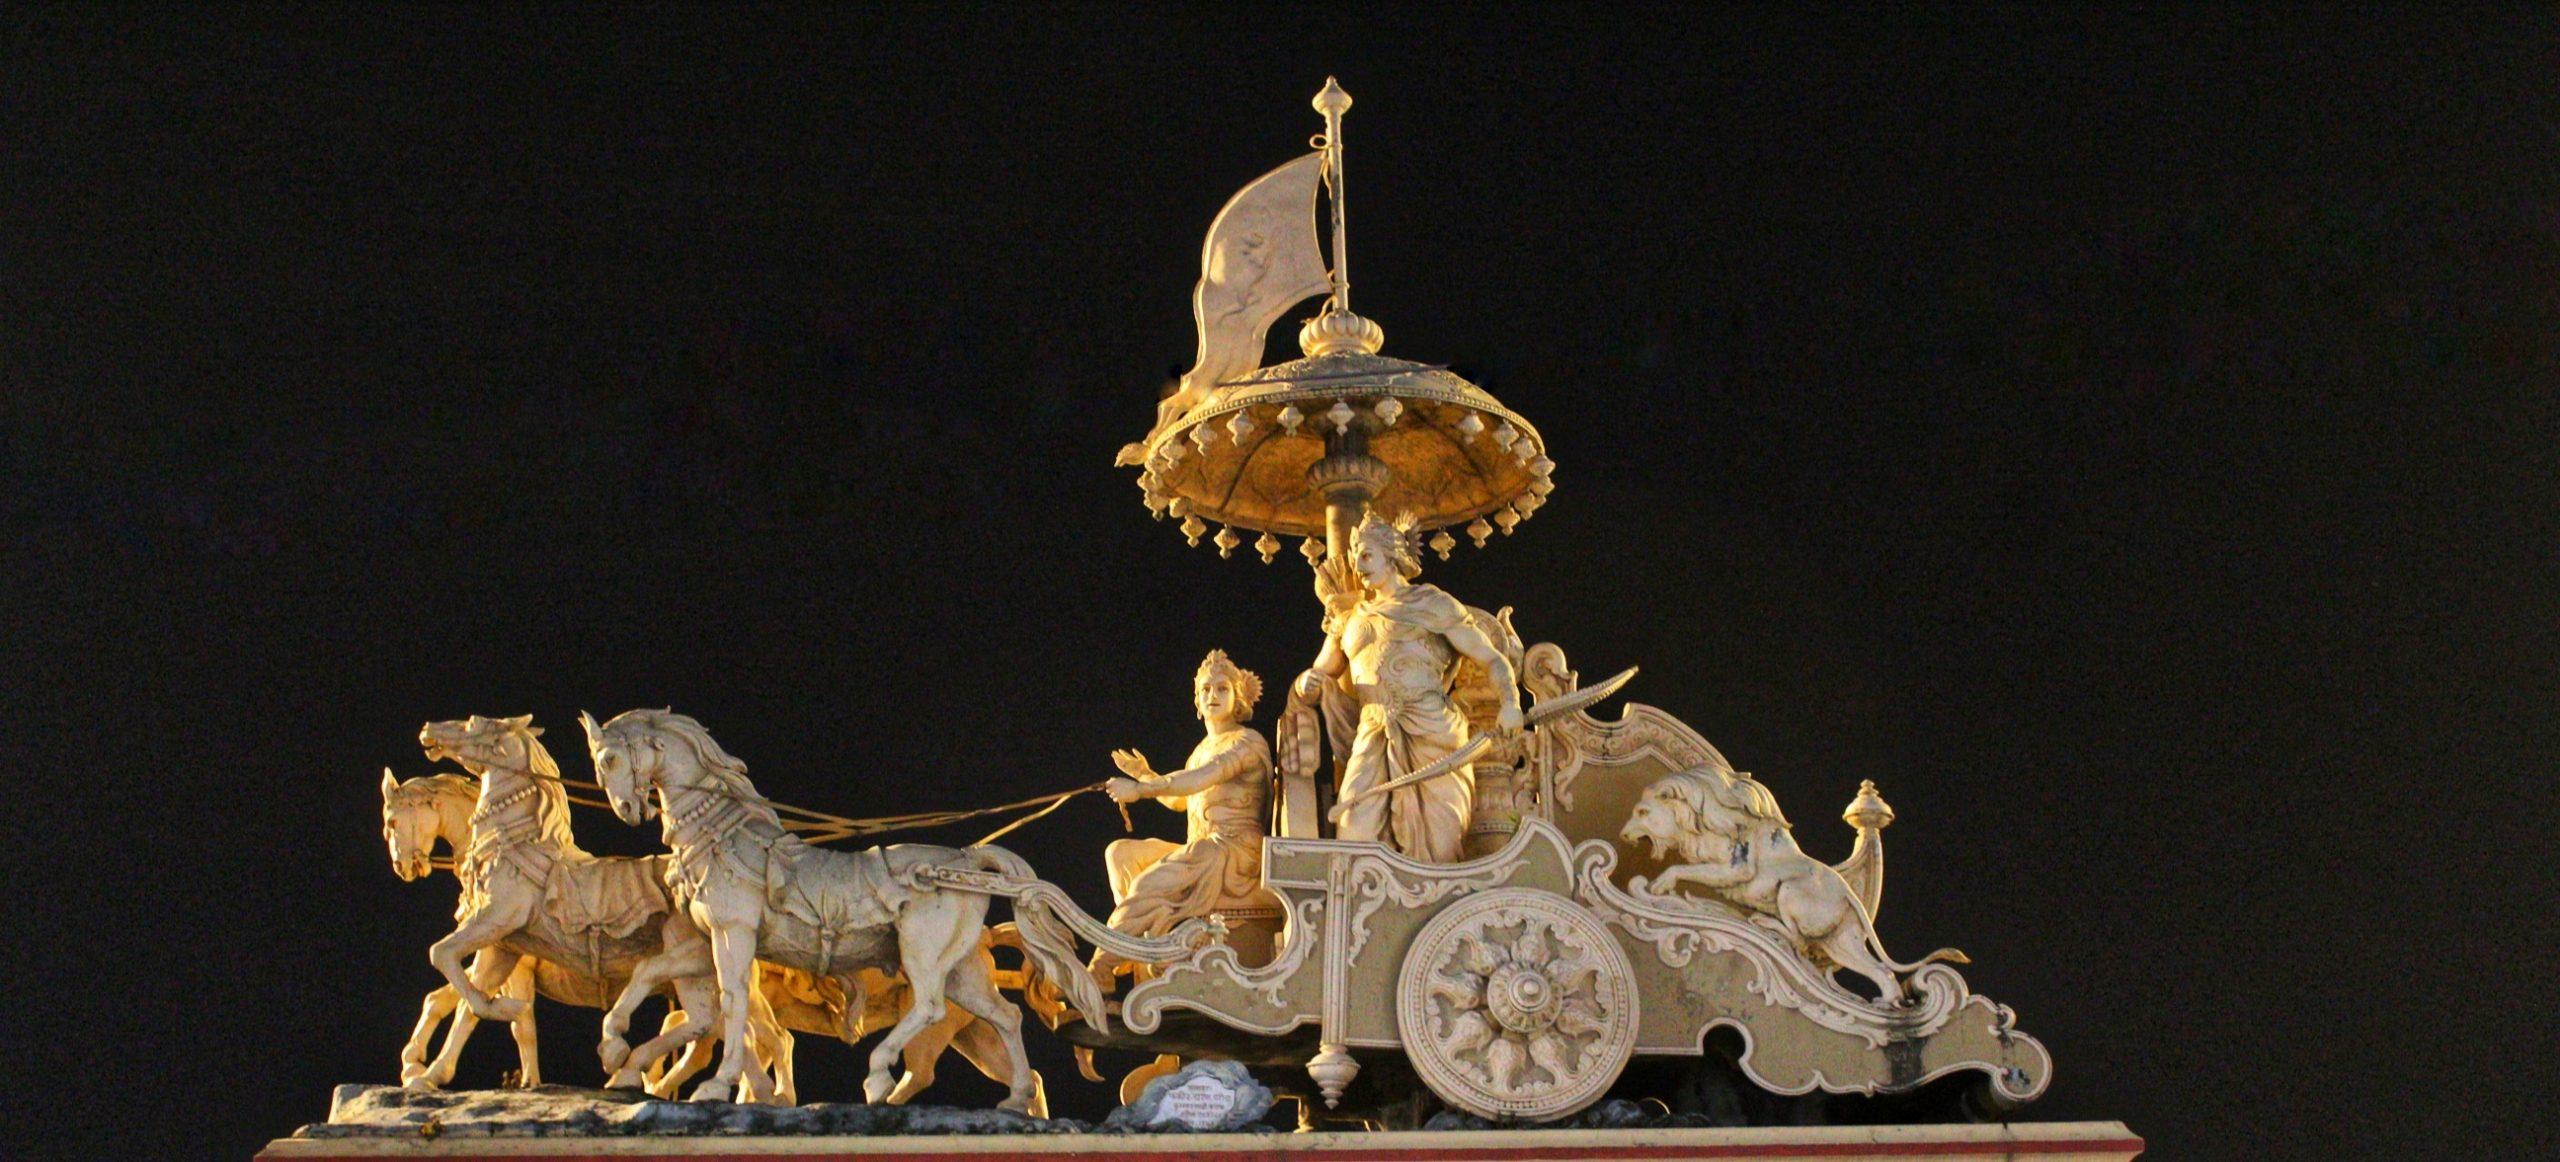 A miniature of Mahabharat Arjuna's cart